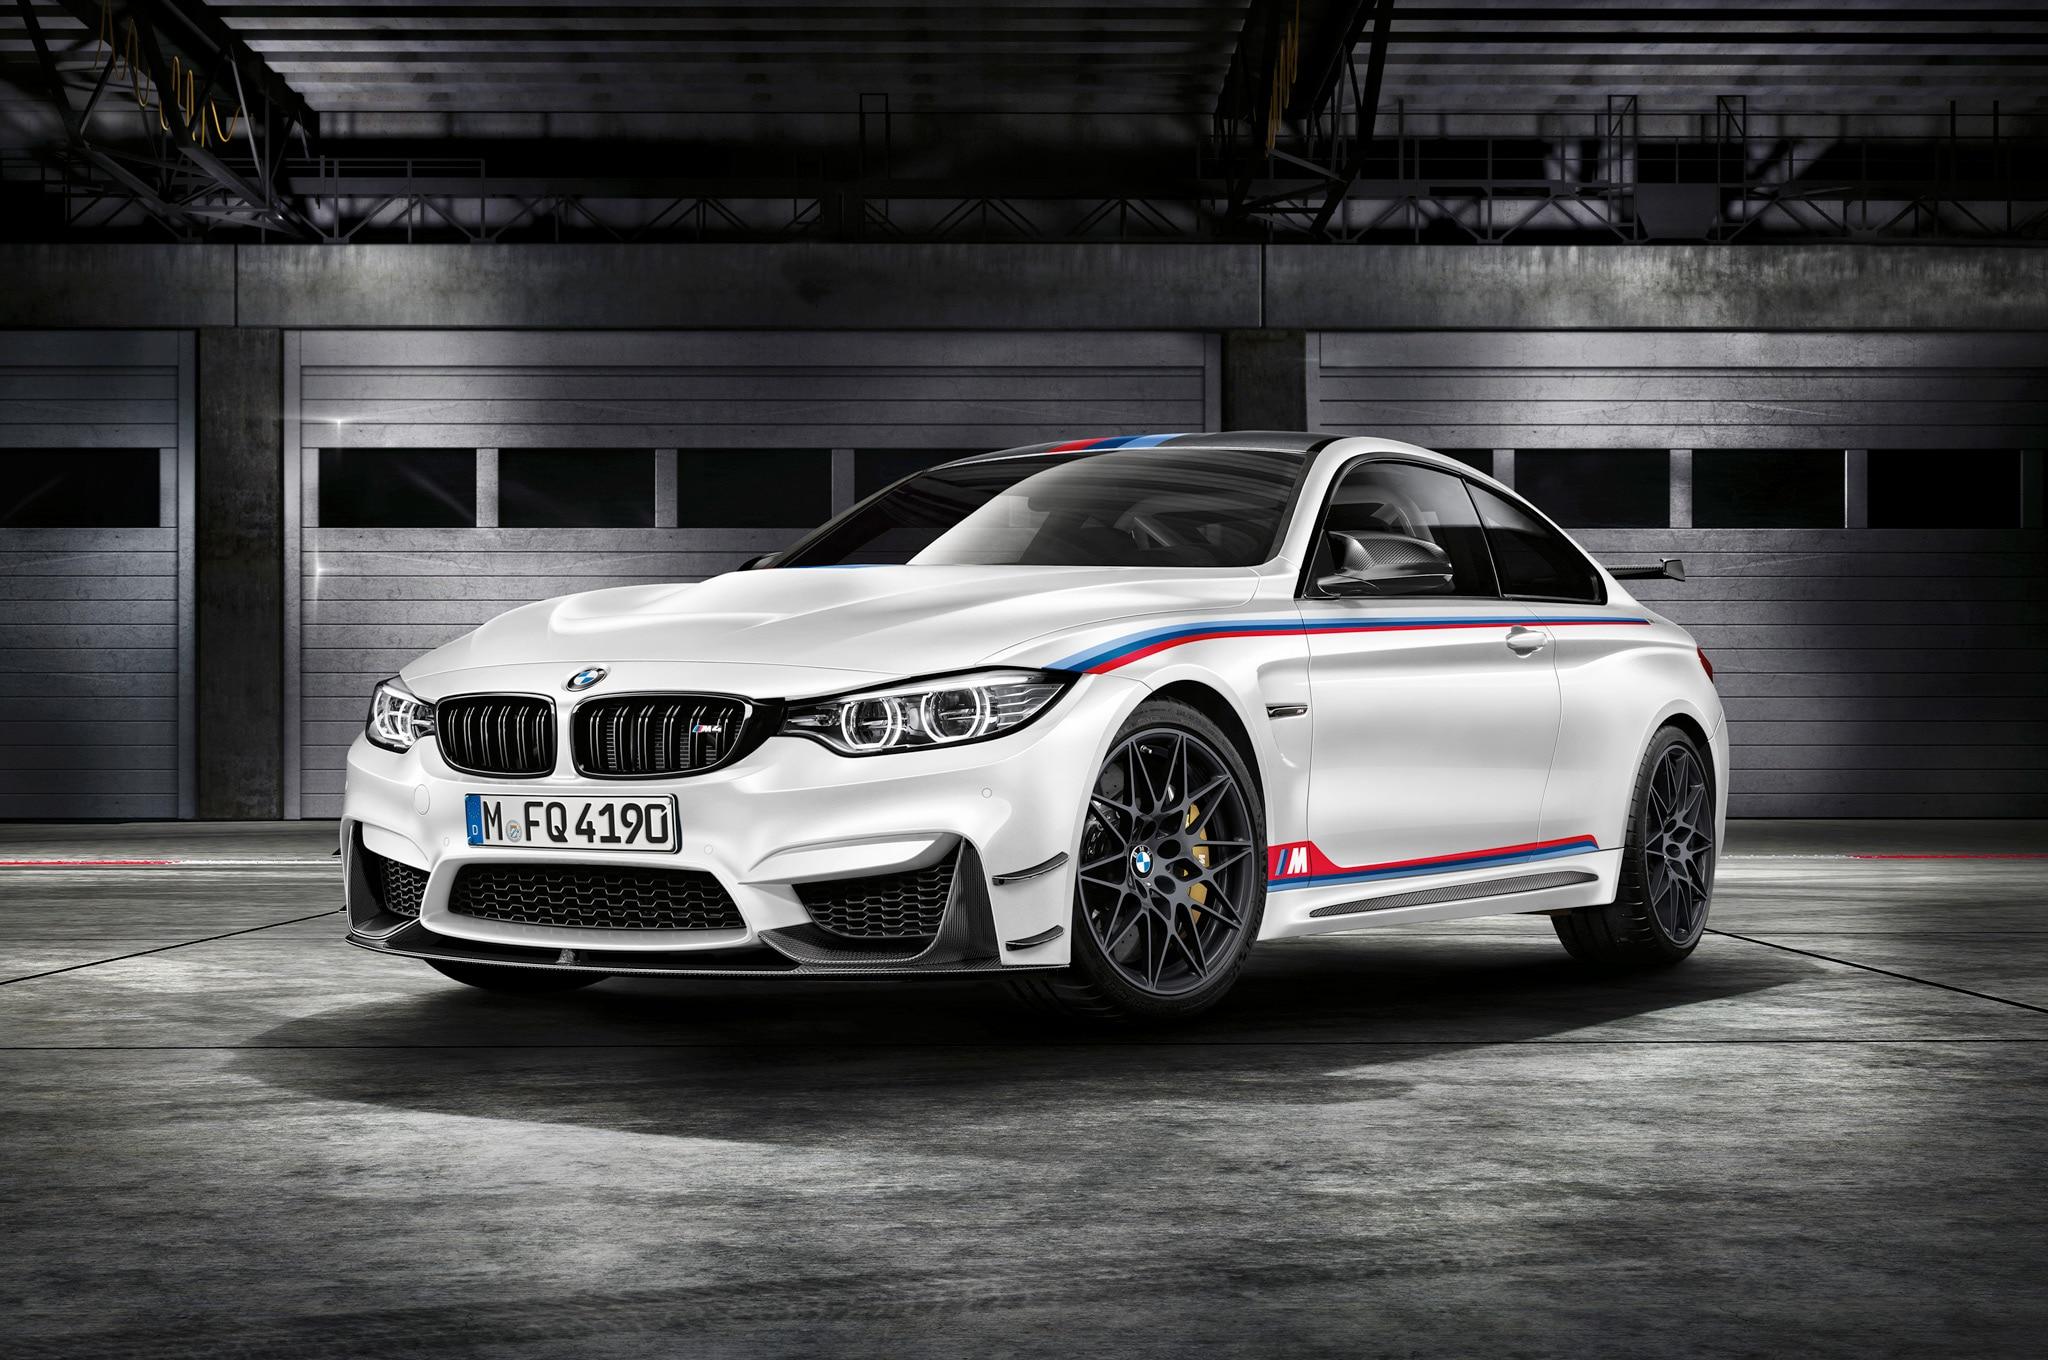 BMW M4 DTM Champion Edition 2